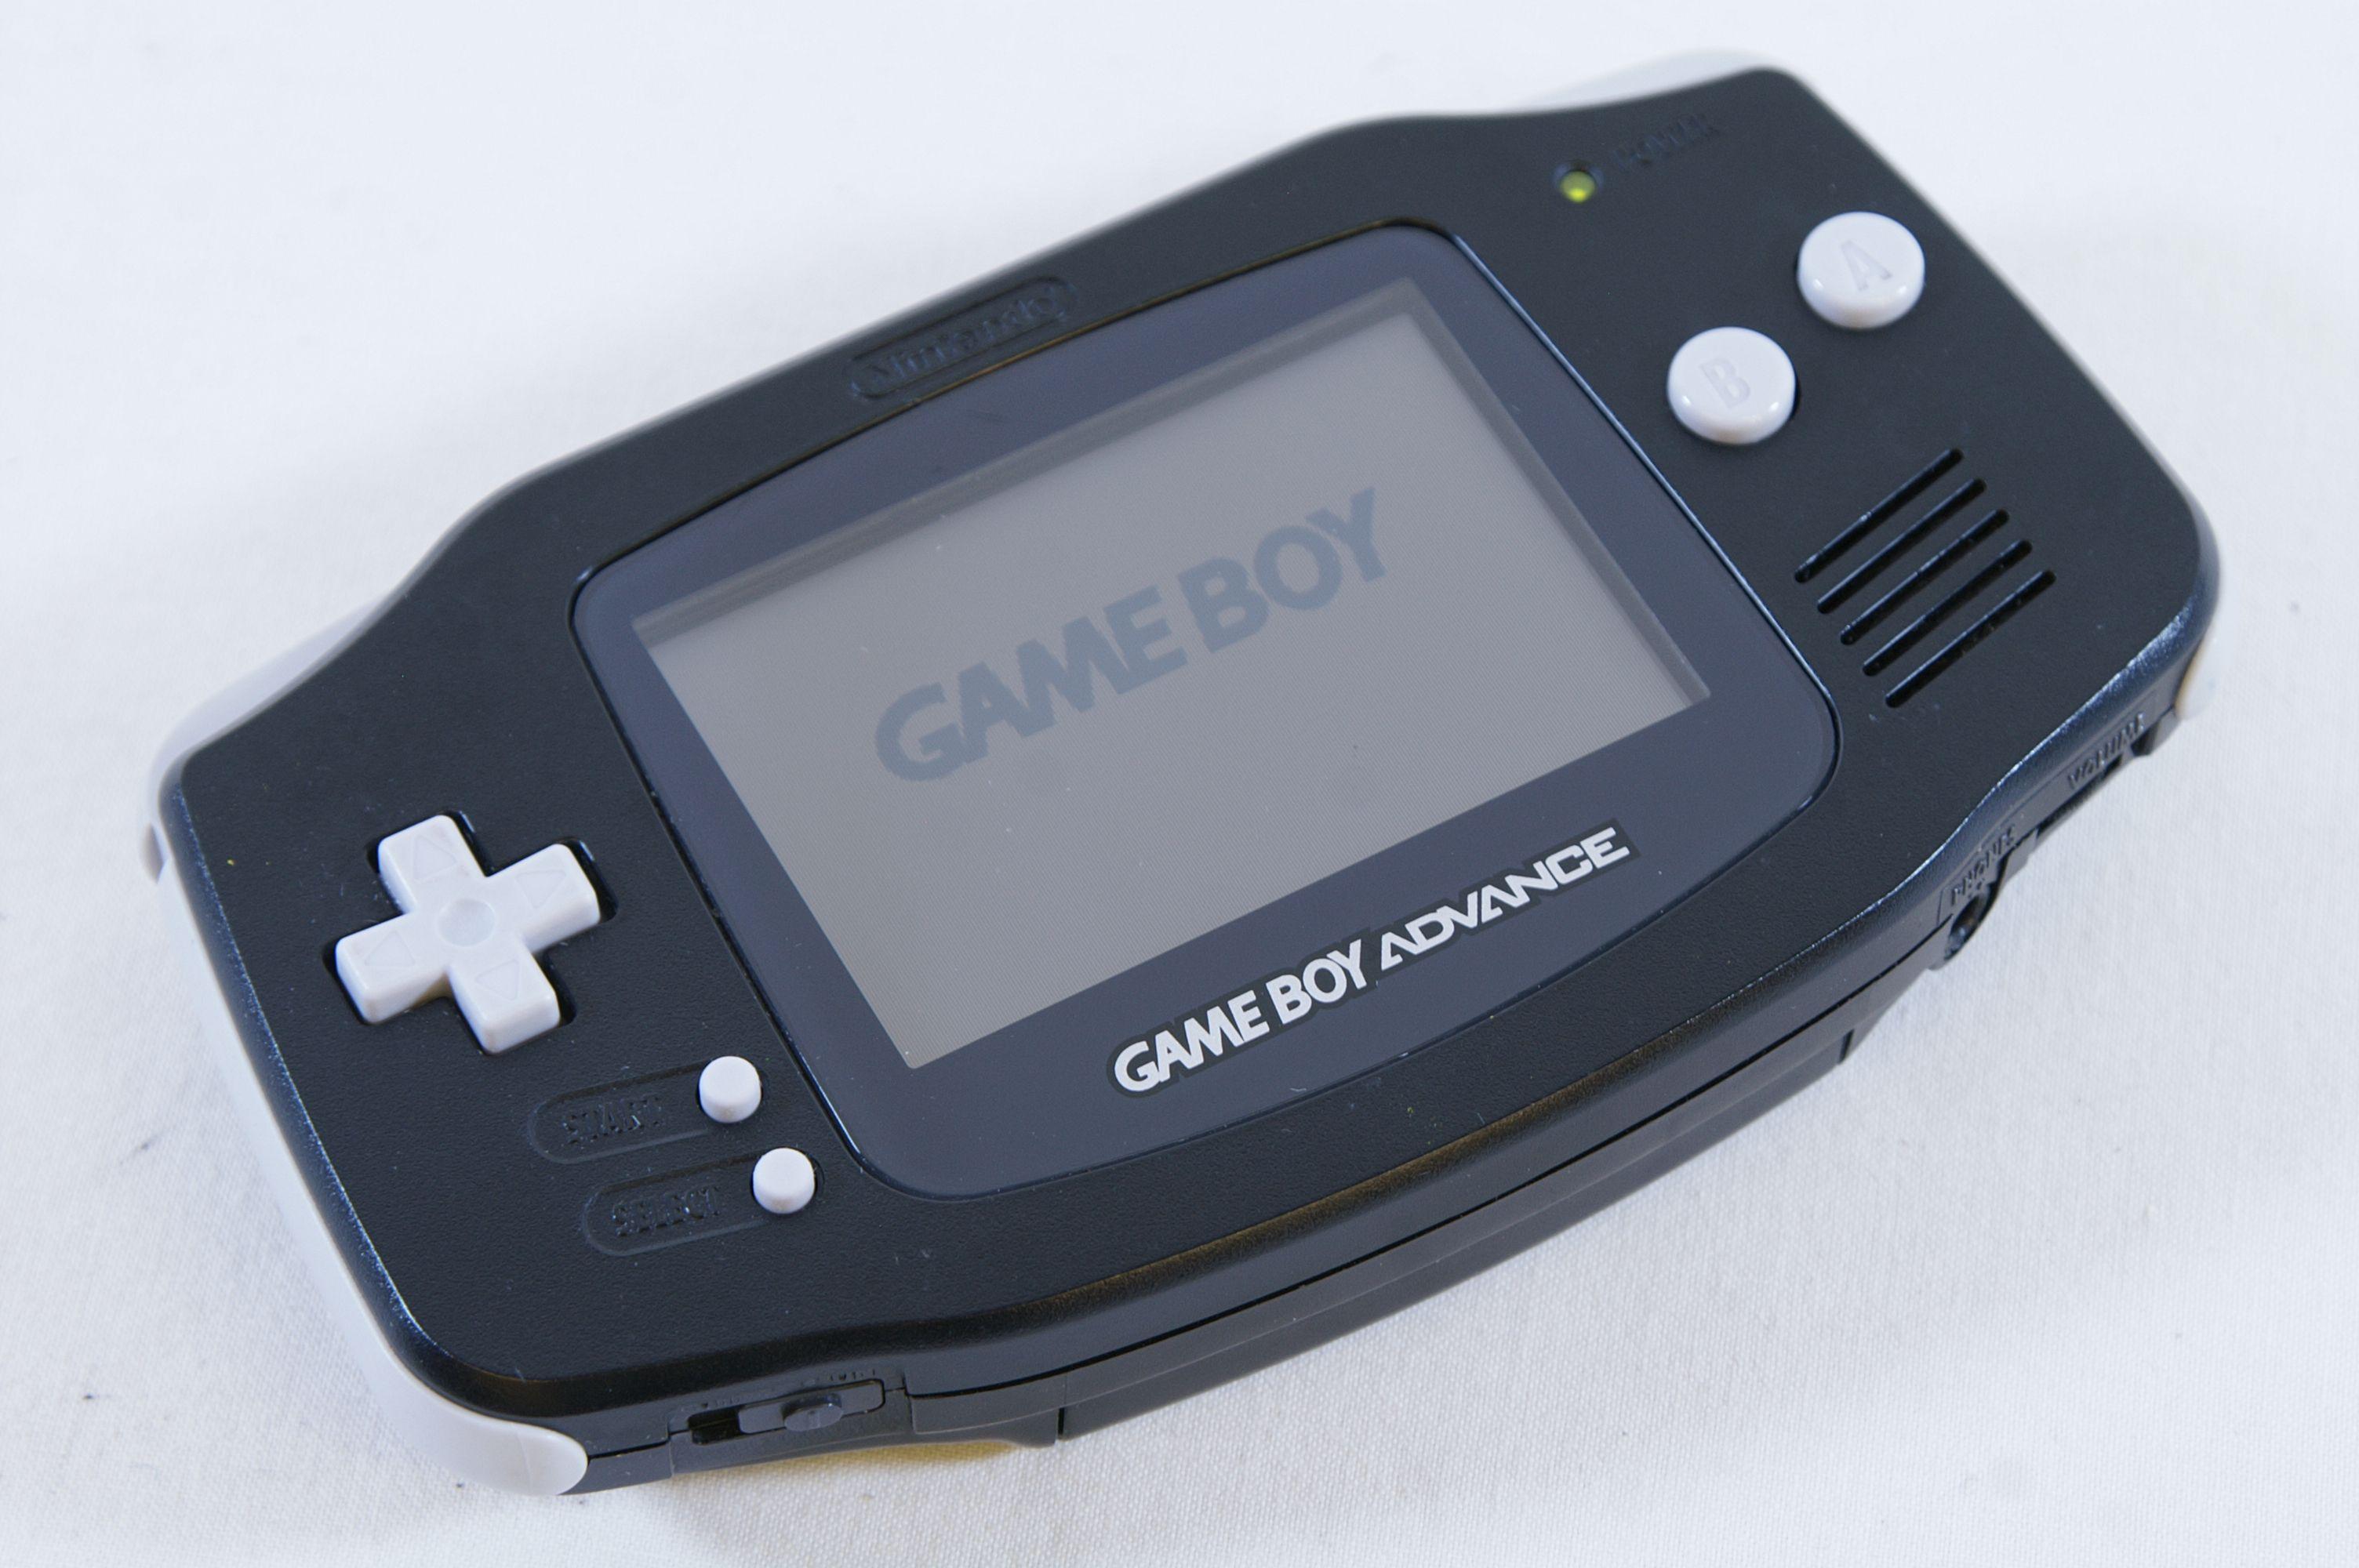 game boy advance gba - HD3008×2000